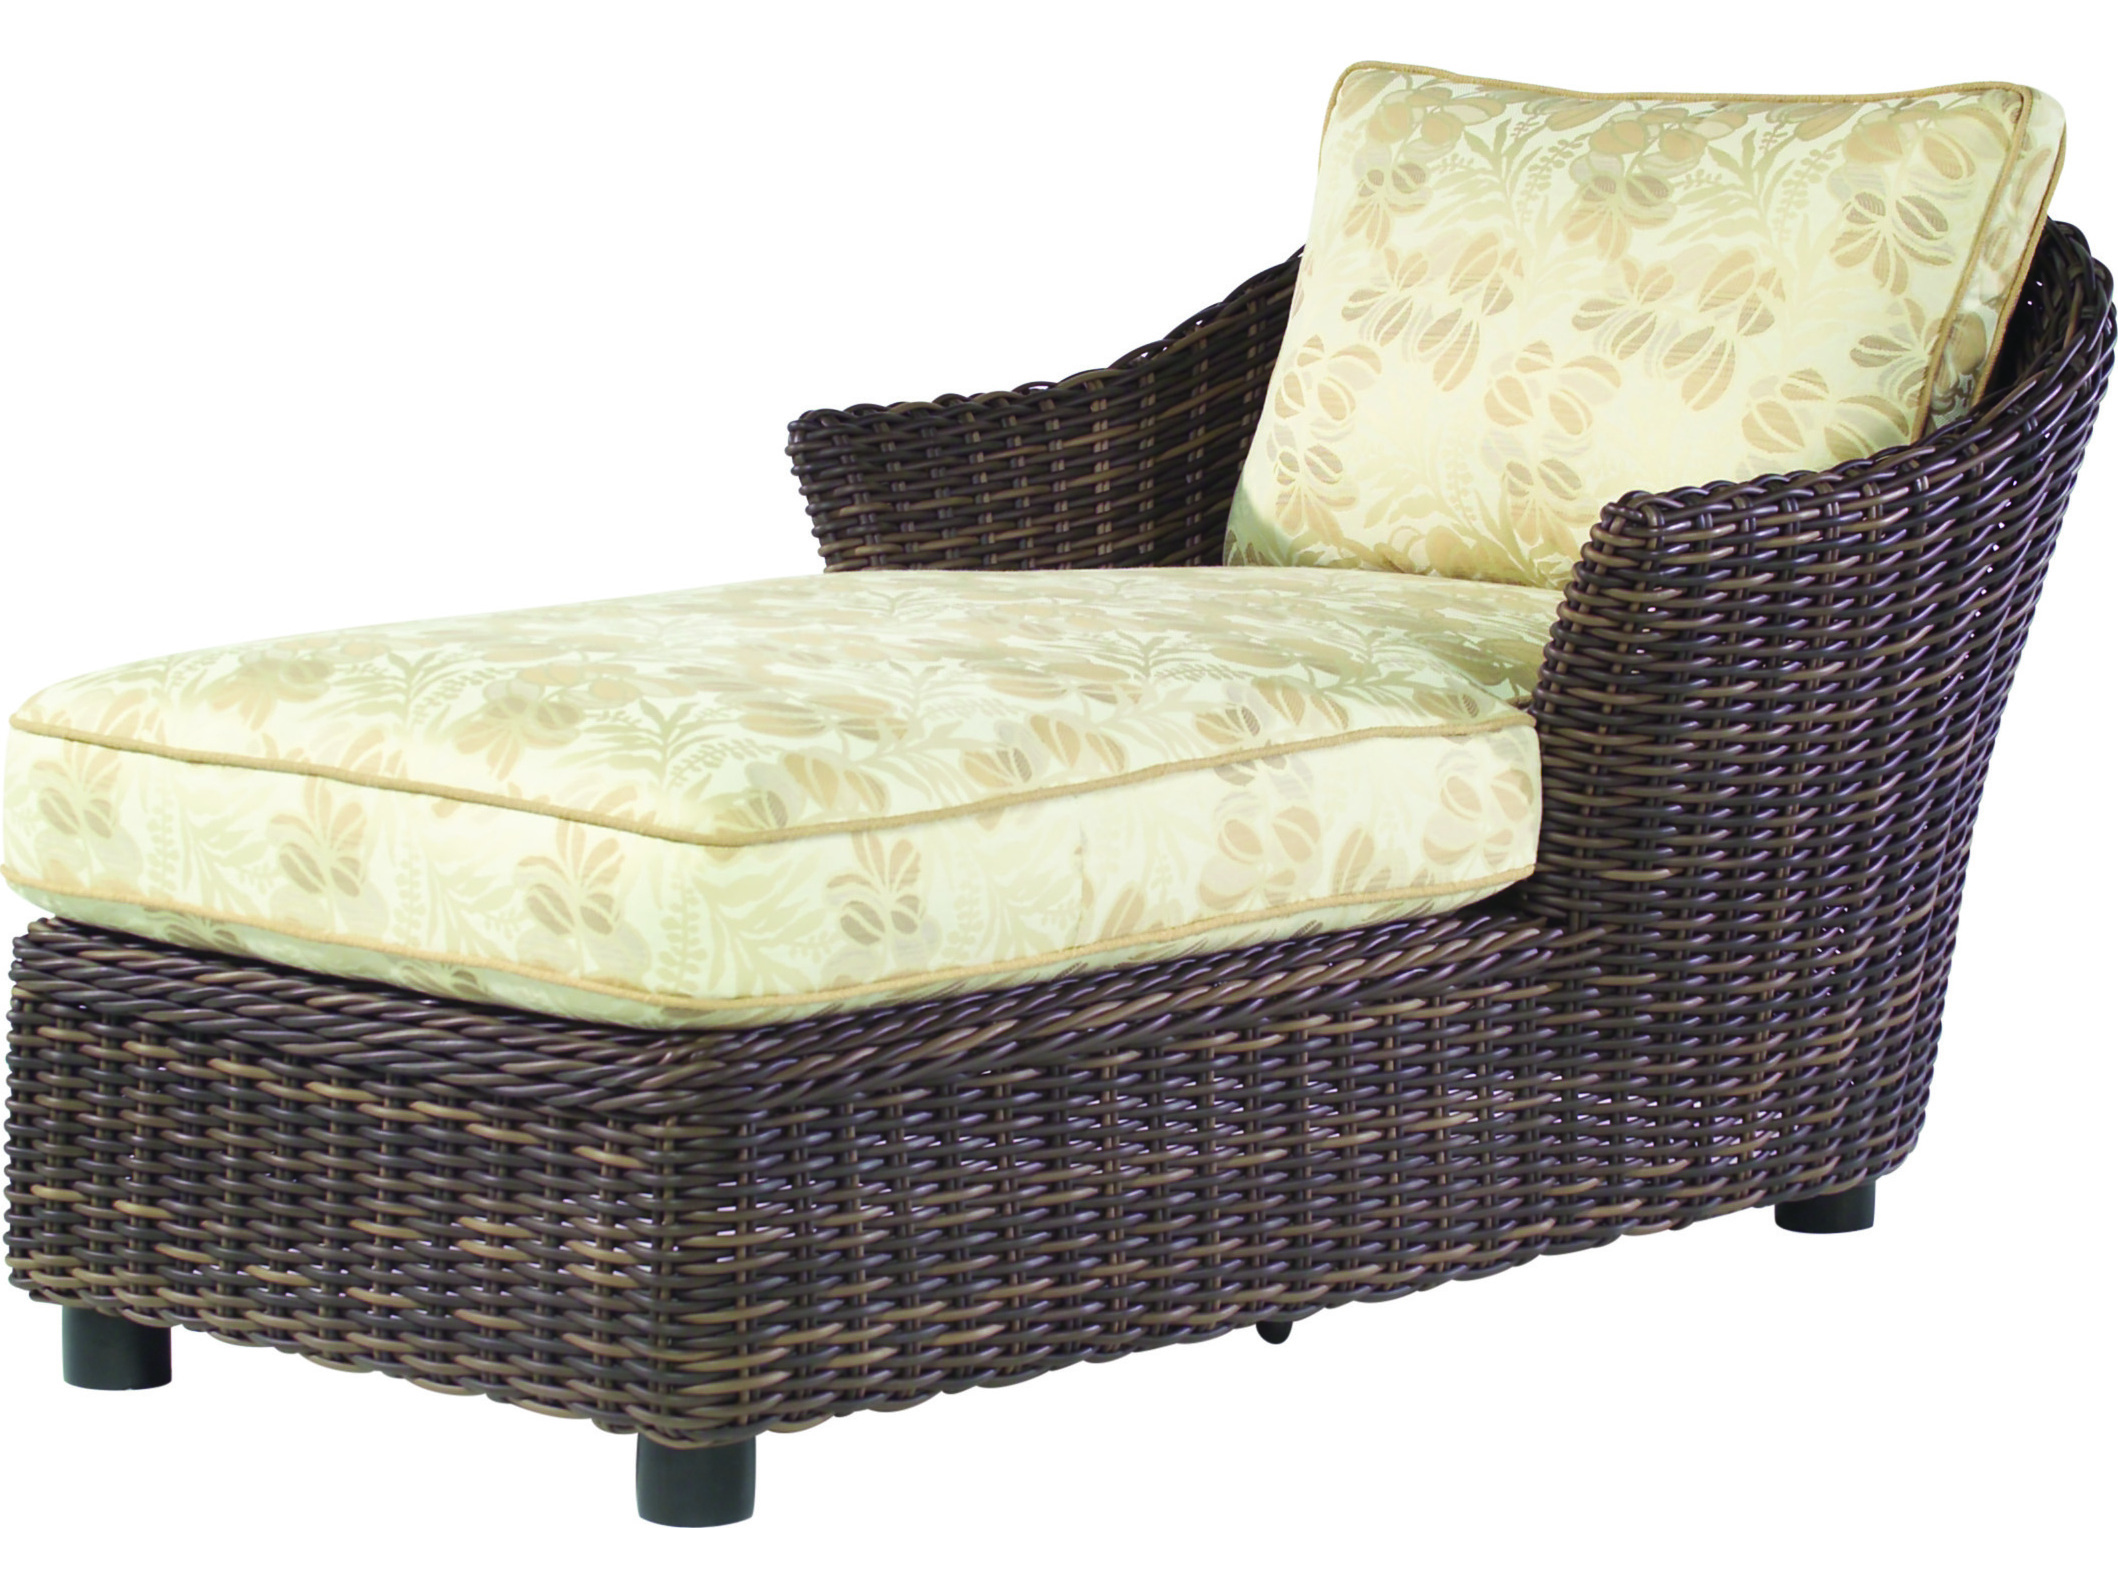 whitecraft sonoma wicker cushion chaise lounge s561041. Black Bedroom Furniture Sets. Home Design Ideas